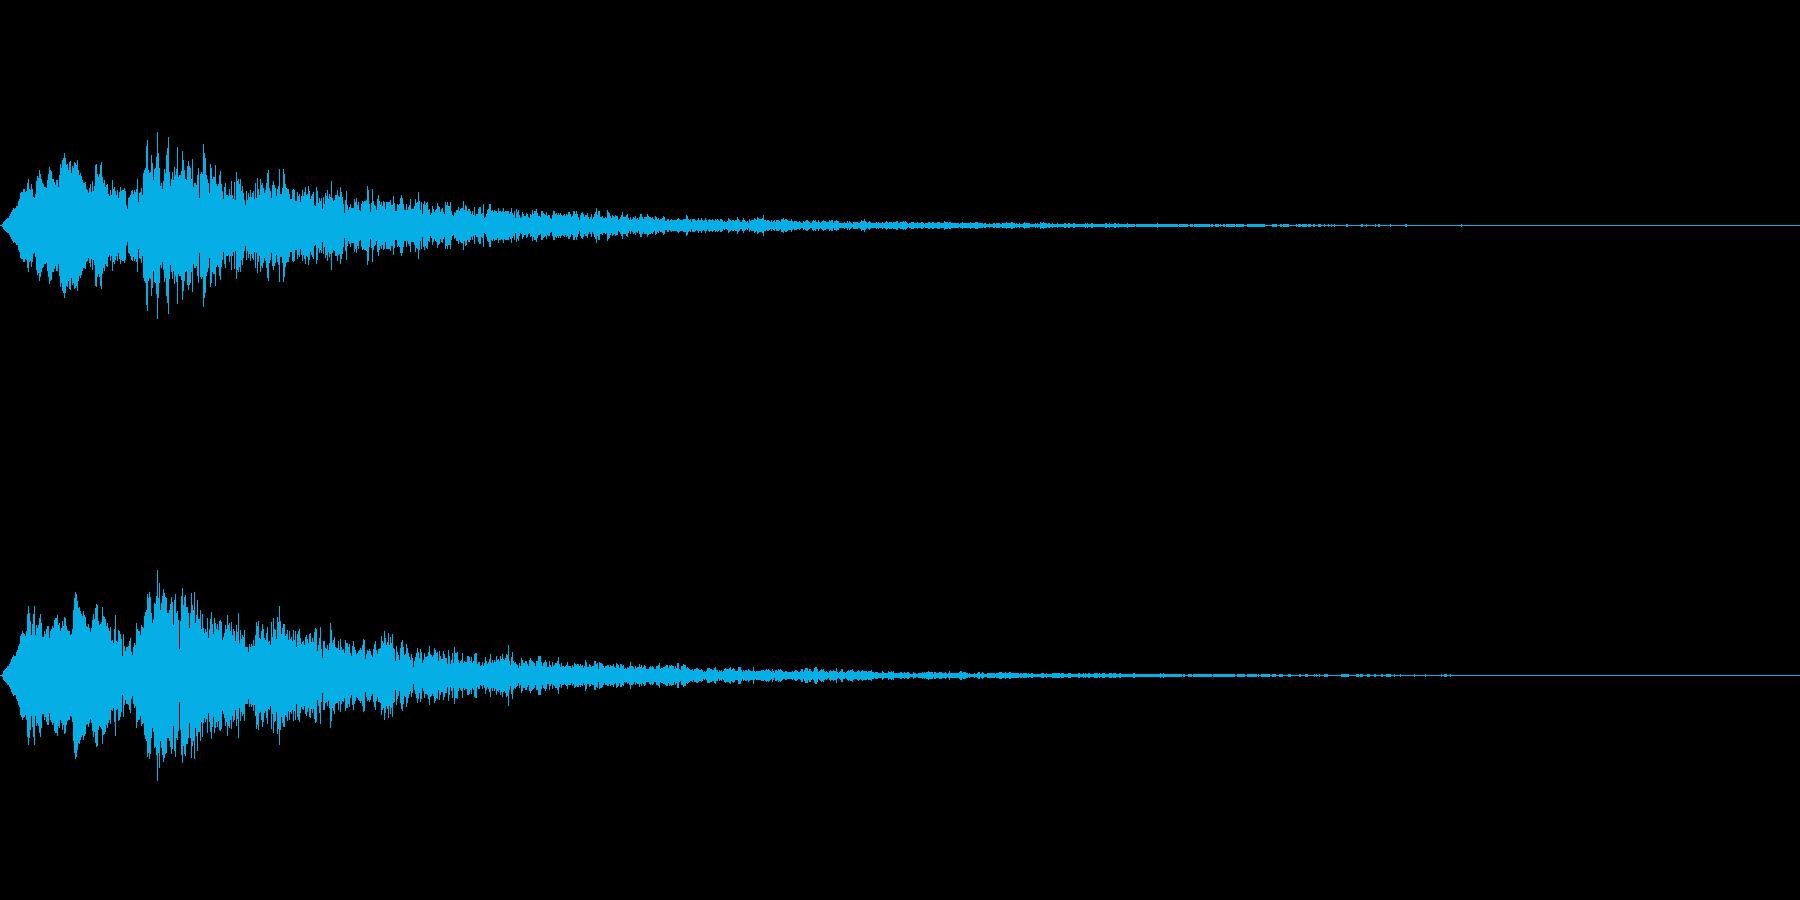 Vox 不気味な鳴き声 ホラーSE 8の再生済みの波形